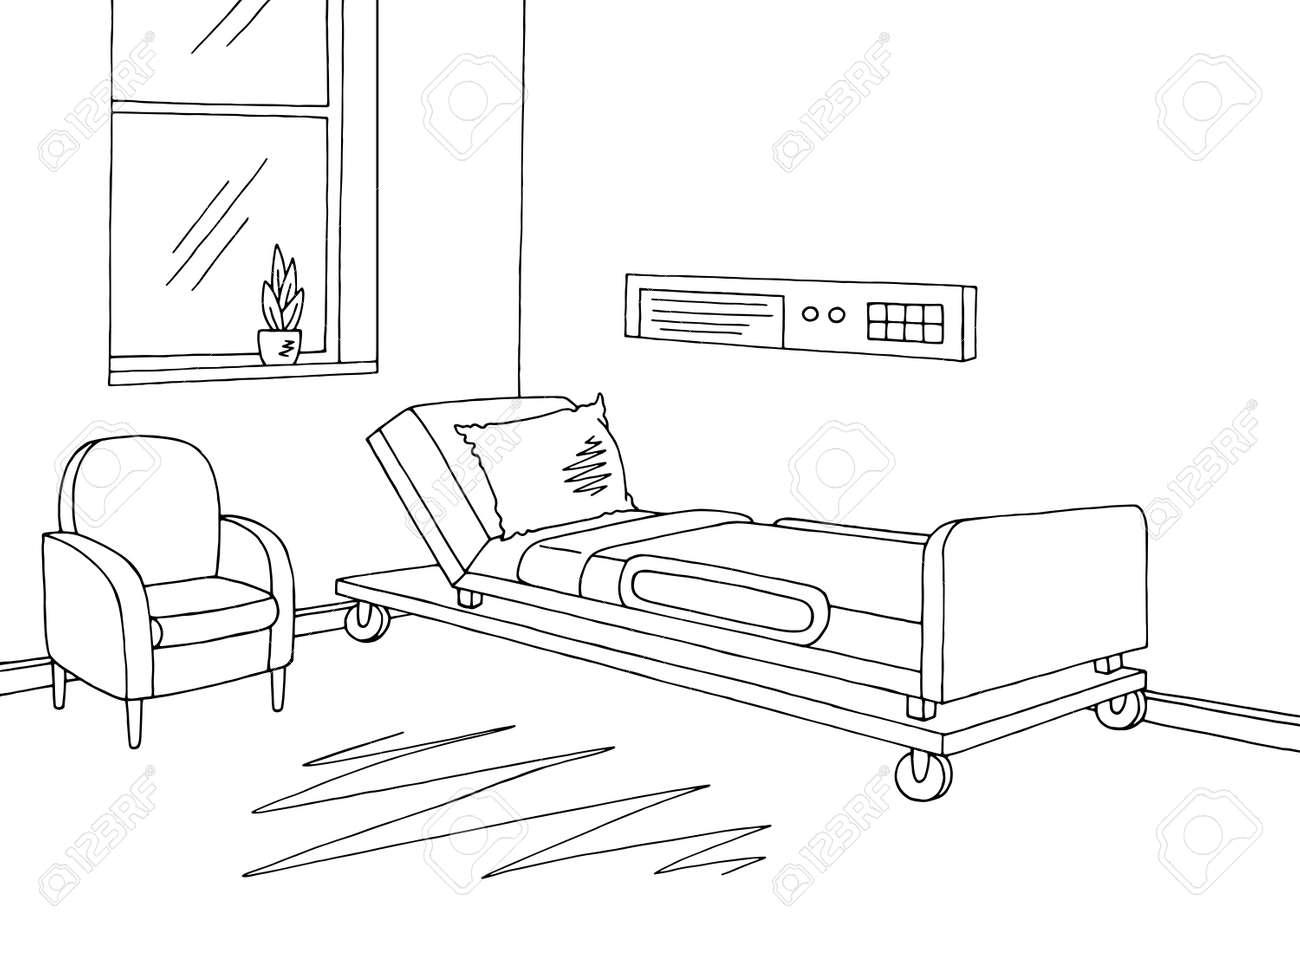 hospital ward graphic black white interior sketch illustration rh 123rf com Emergency Room Sketch Hospital Room Drawing